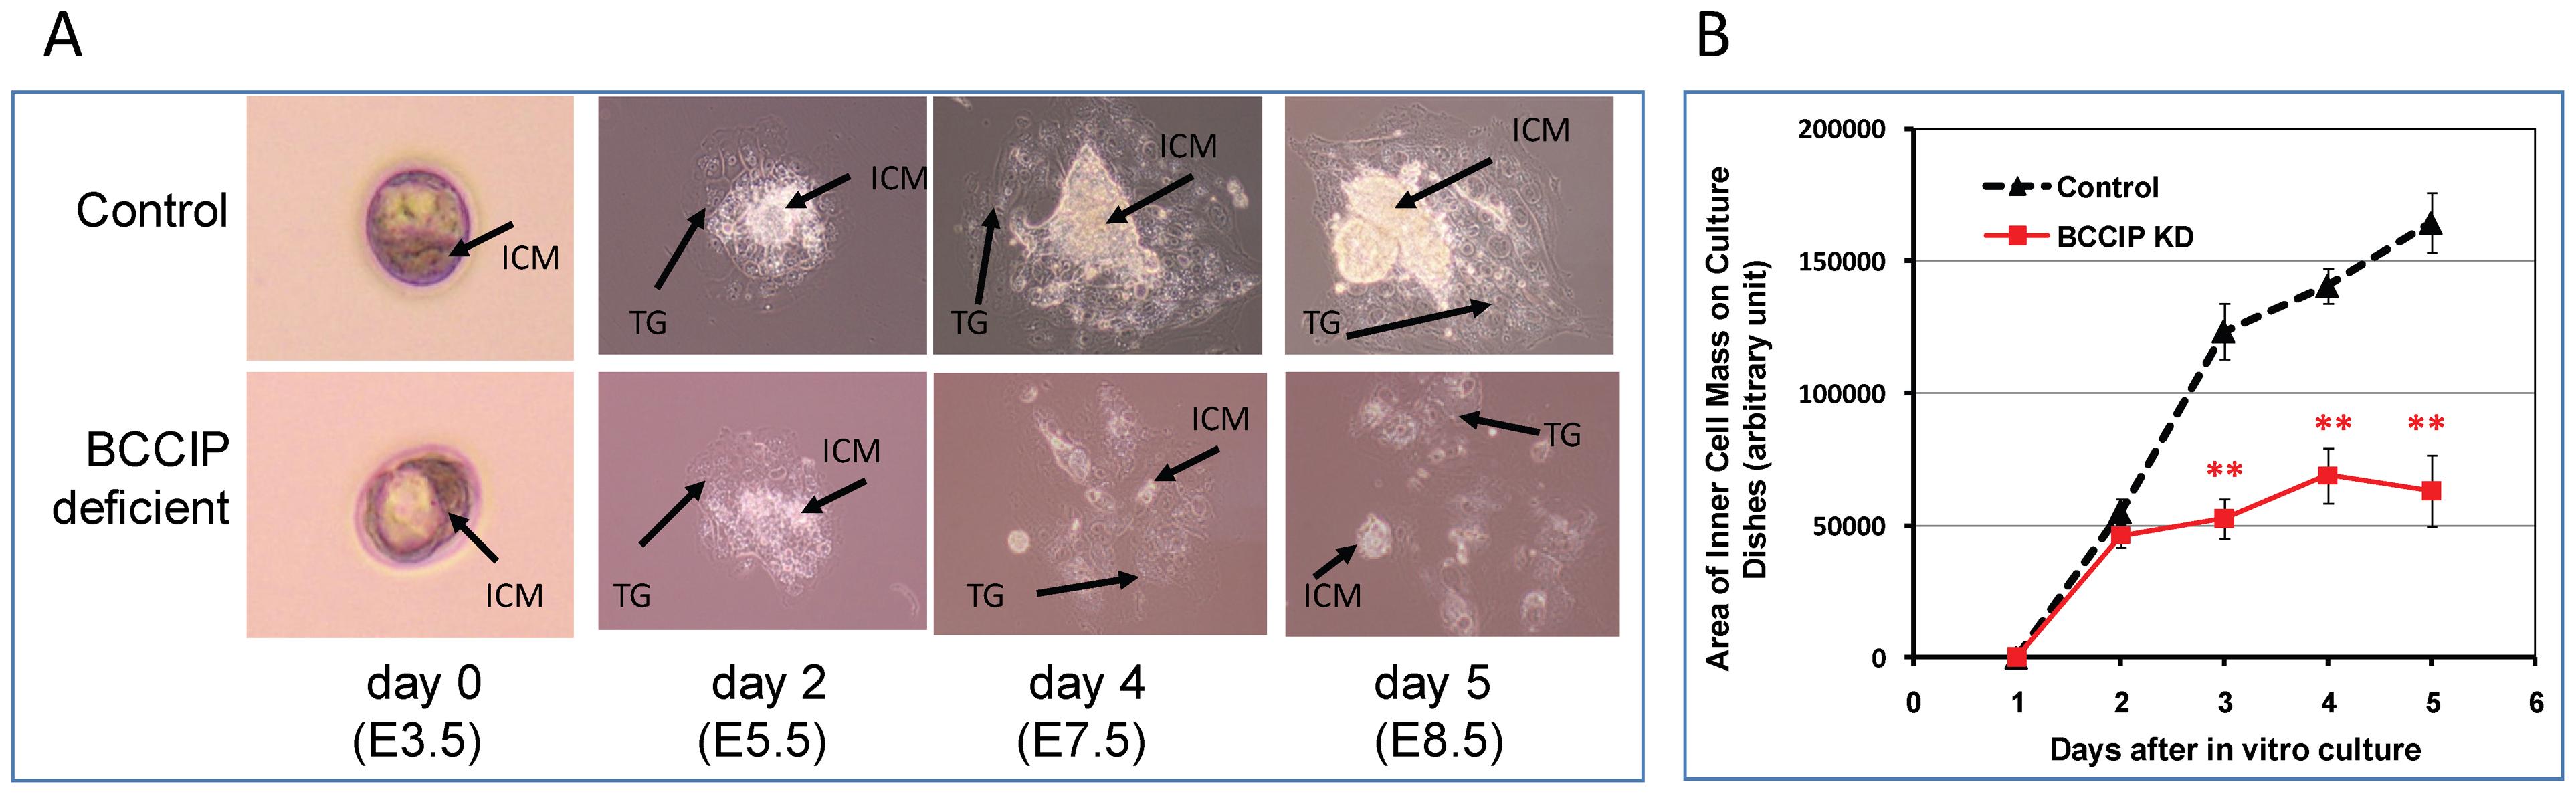 Proliferation defects of BCCIP-deficient blastocysts.